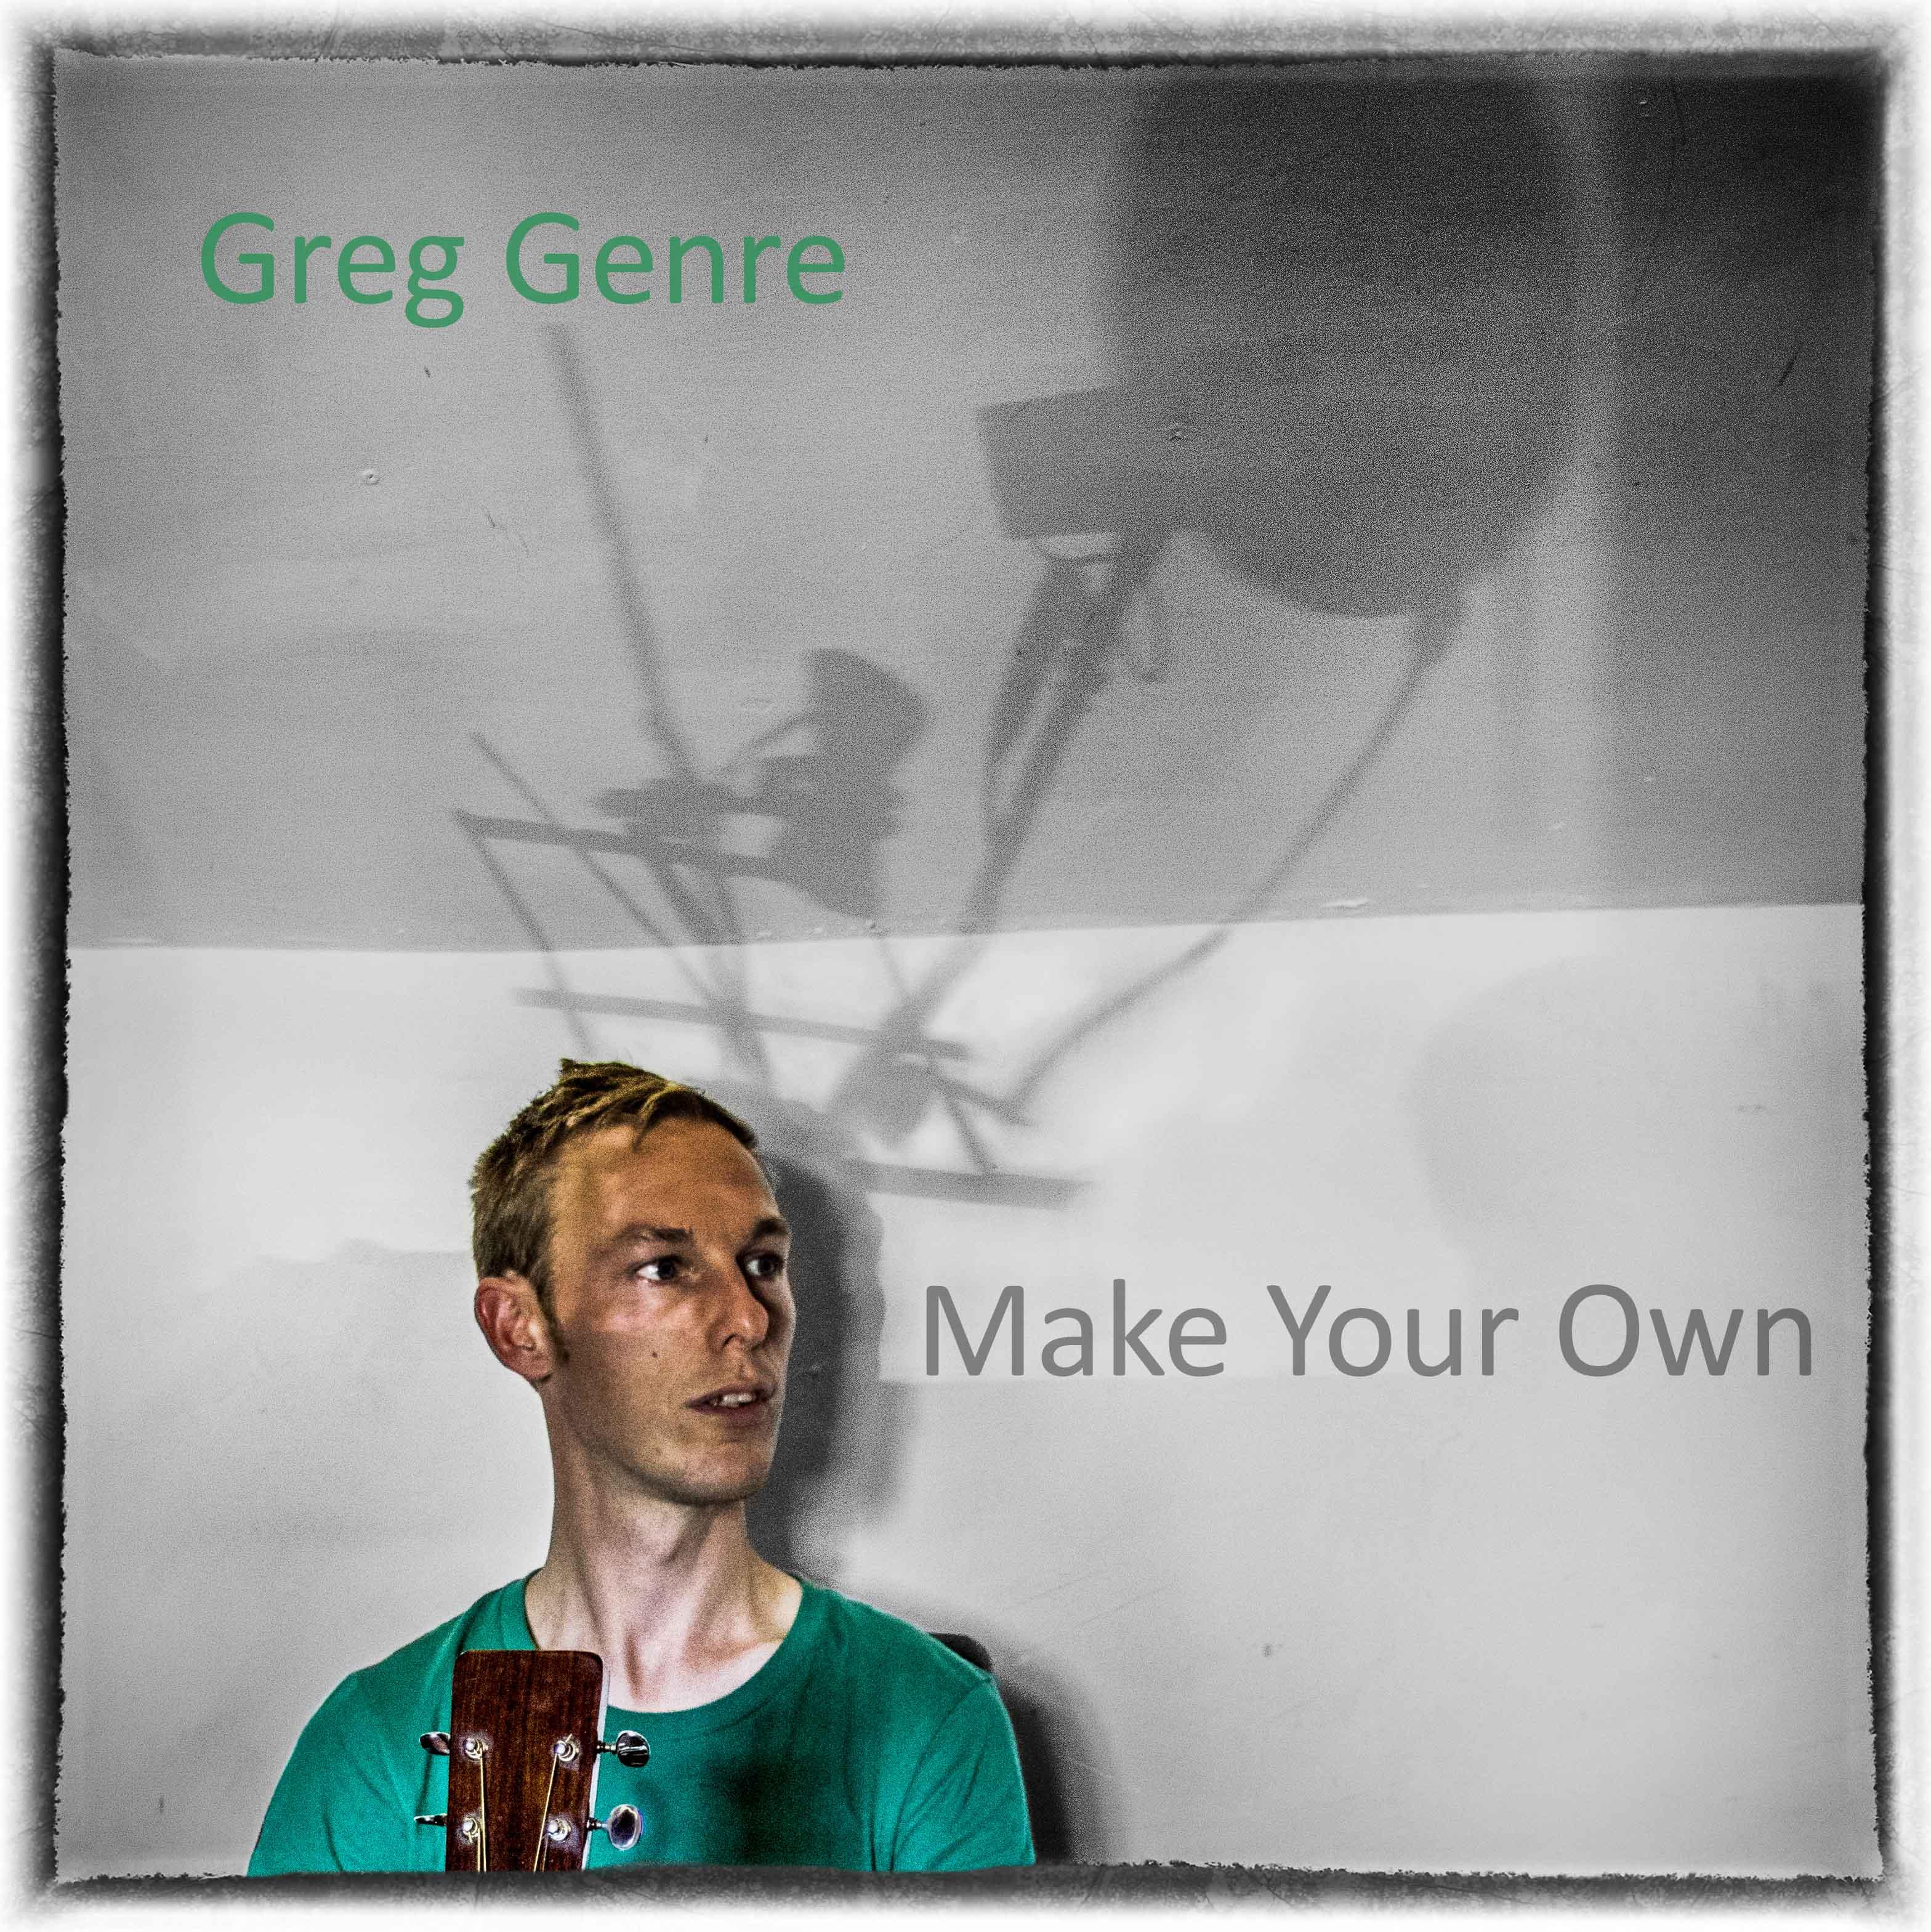 Make Your Own - Greg Genre